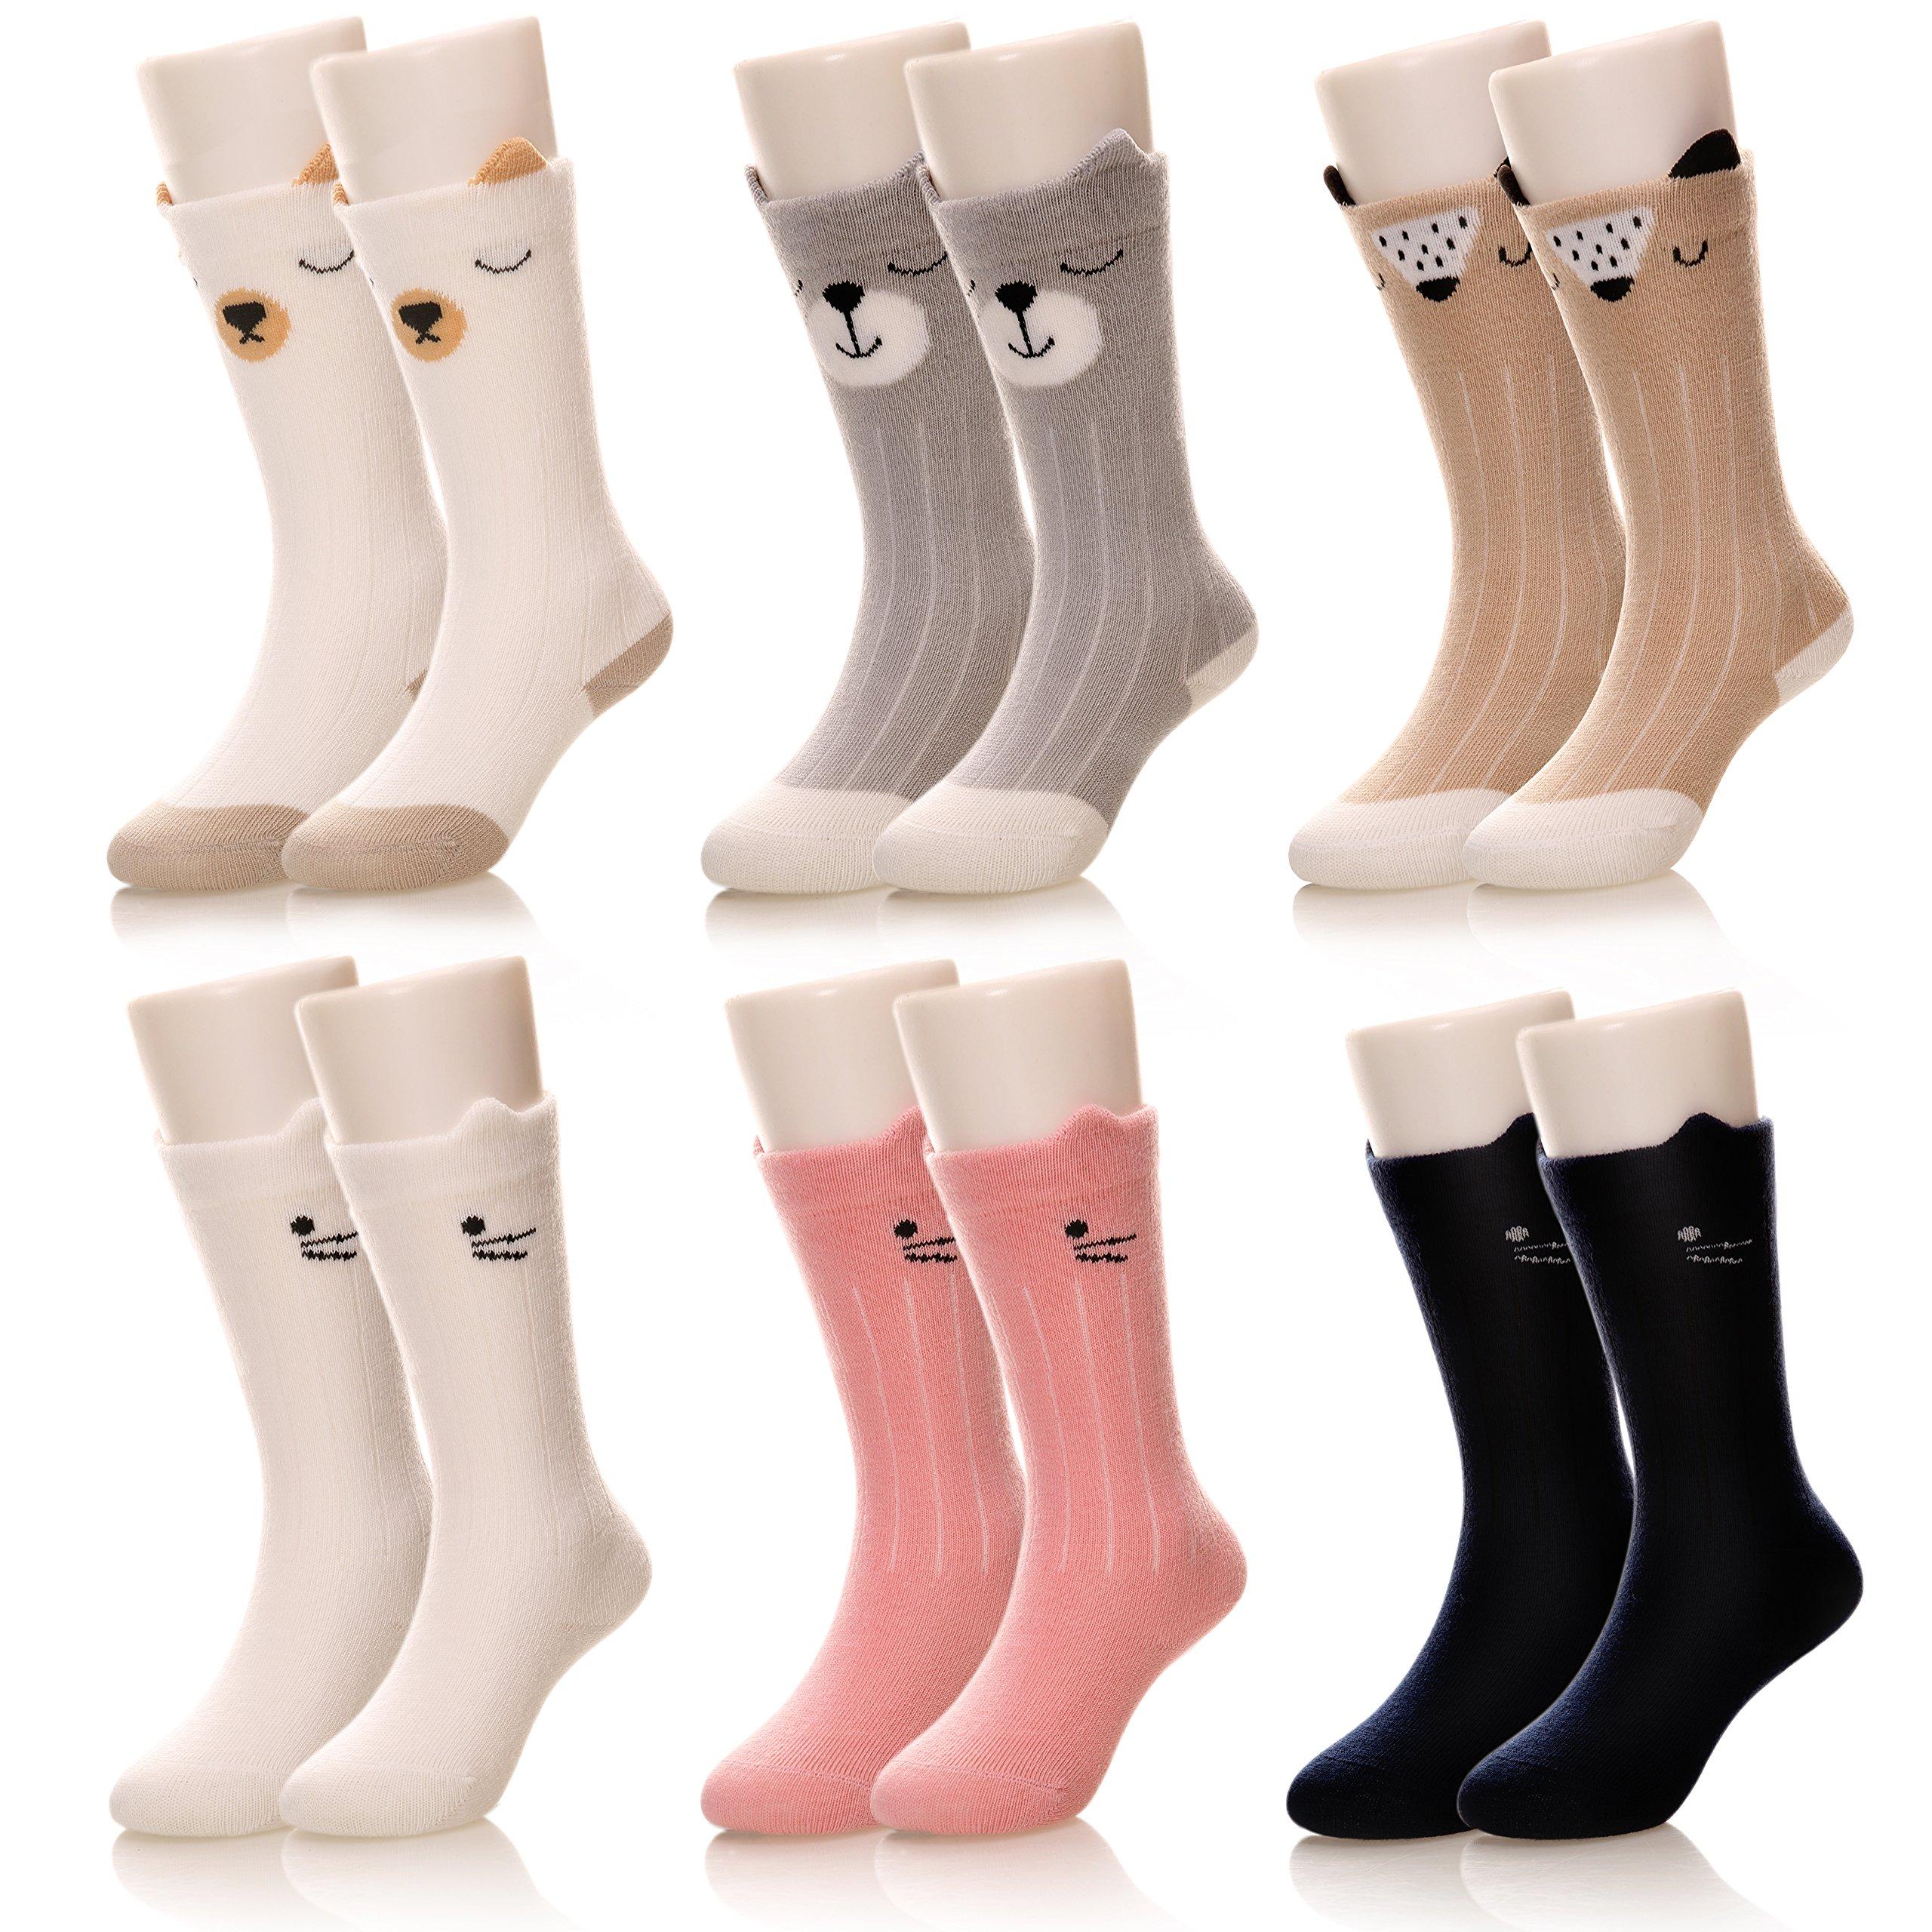 Eocom Kids Girls Boys Cute Animal Casual Knee High Cotton Socks 6 Pairs (0-1 Years, 6 Pairs Cat/Bear)